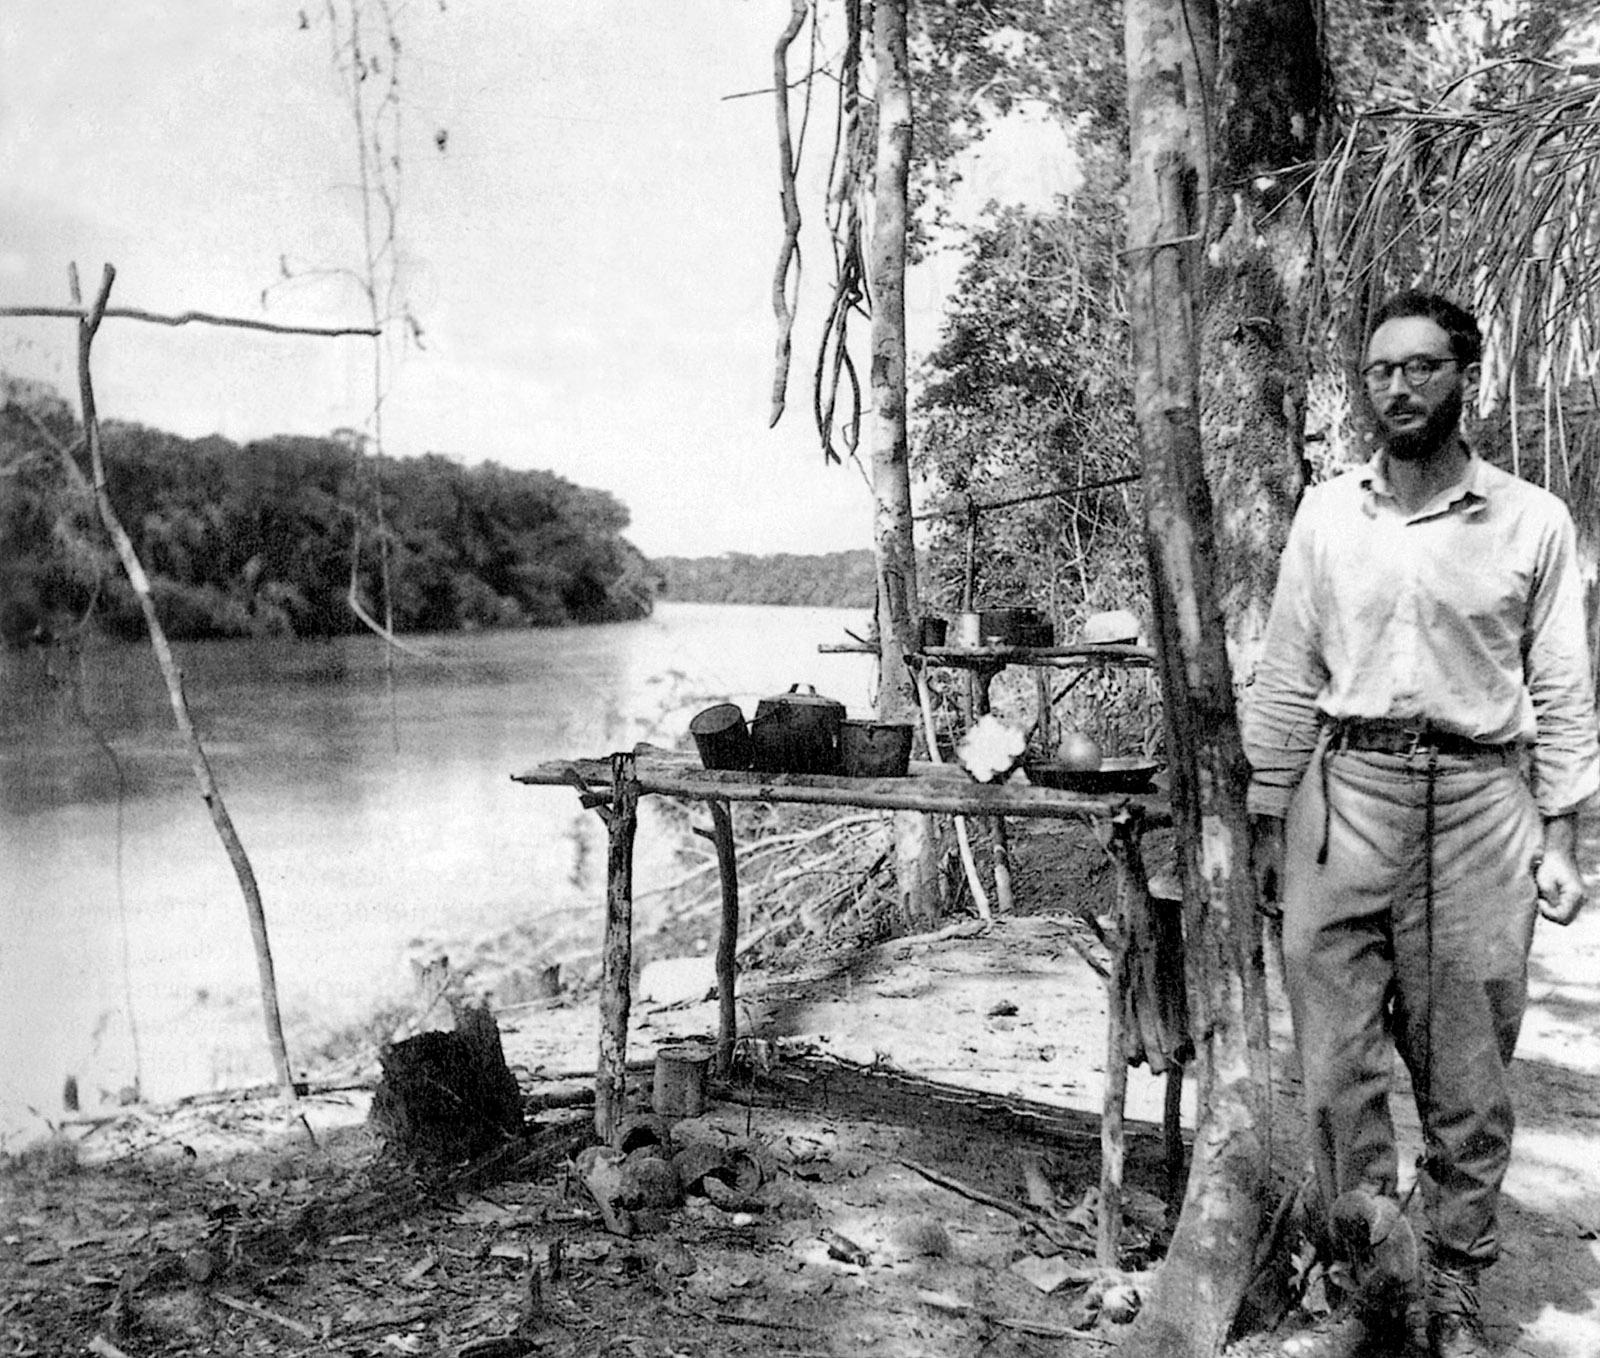 Claude Lévi-Strauss in Brazil, circa 1936